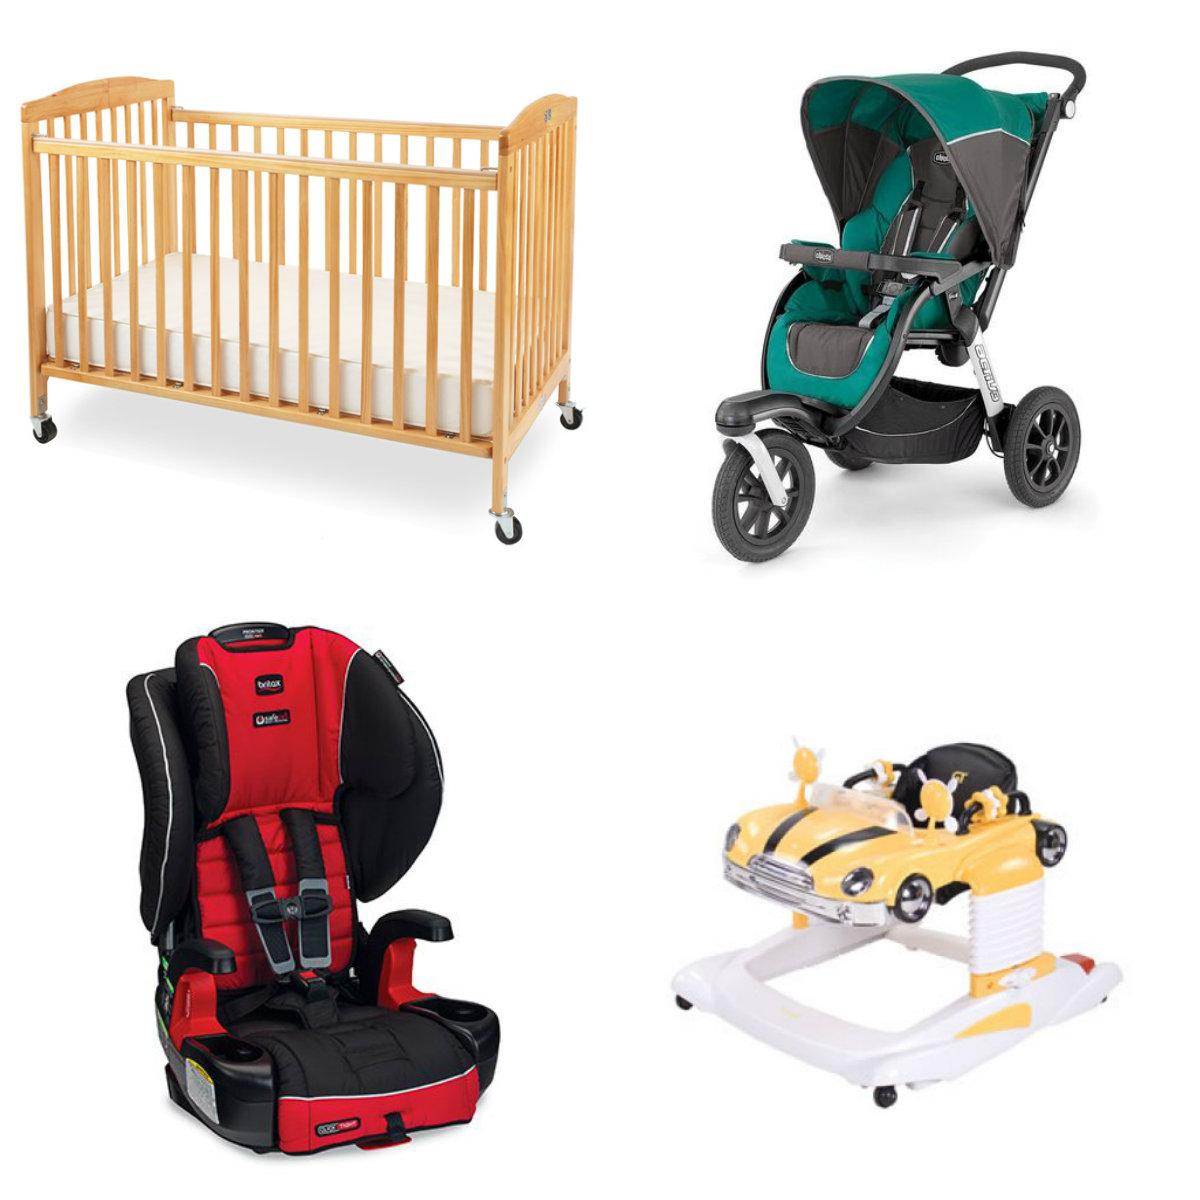 sedan chair rental captain chairs for sprinter van baby equipment rentals crib and breast pump